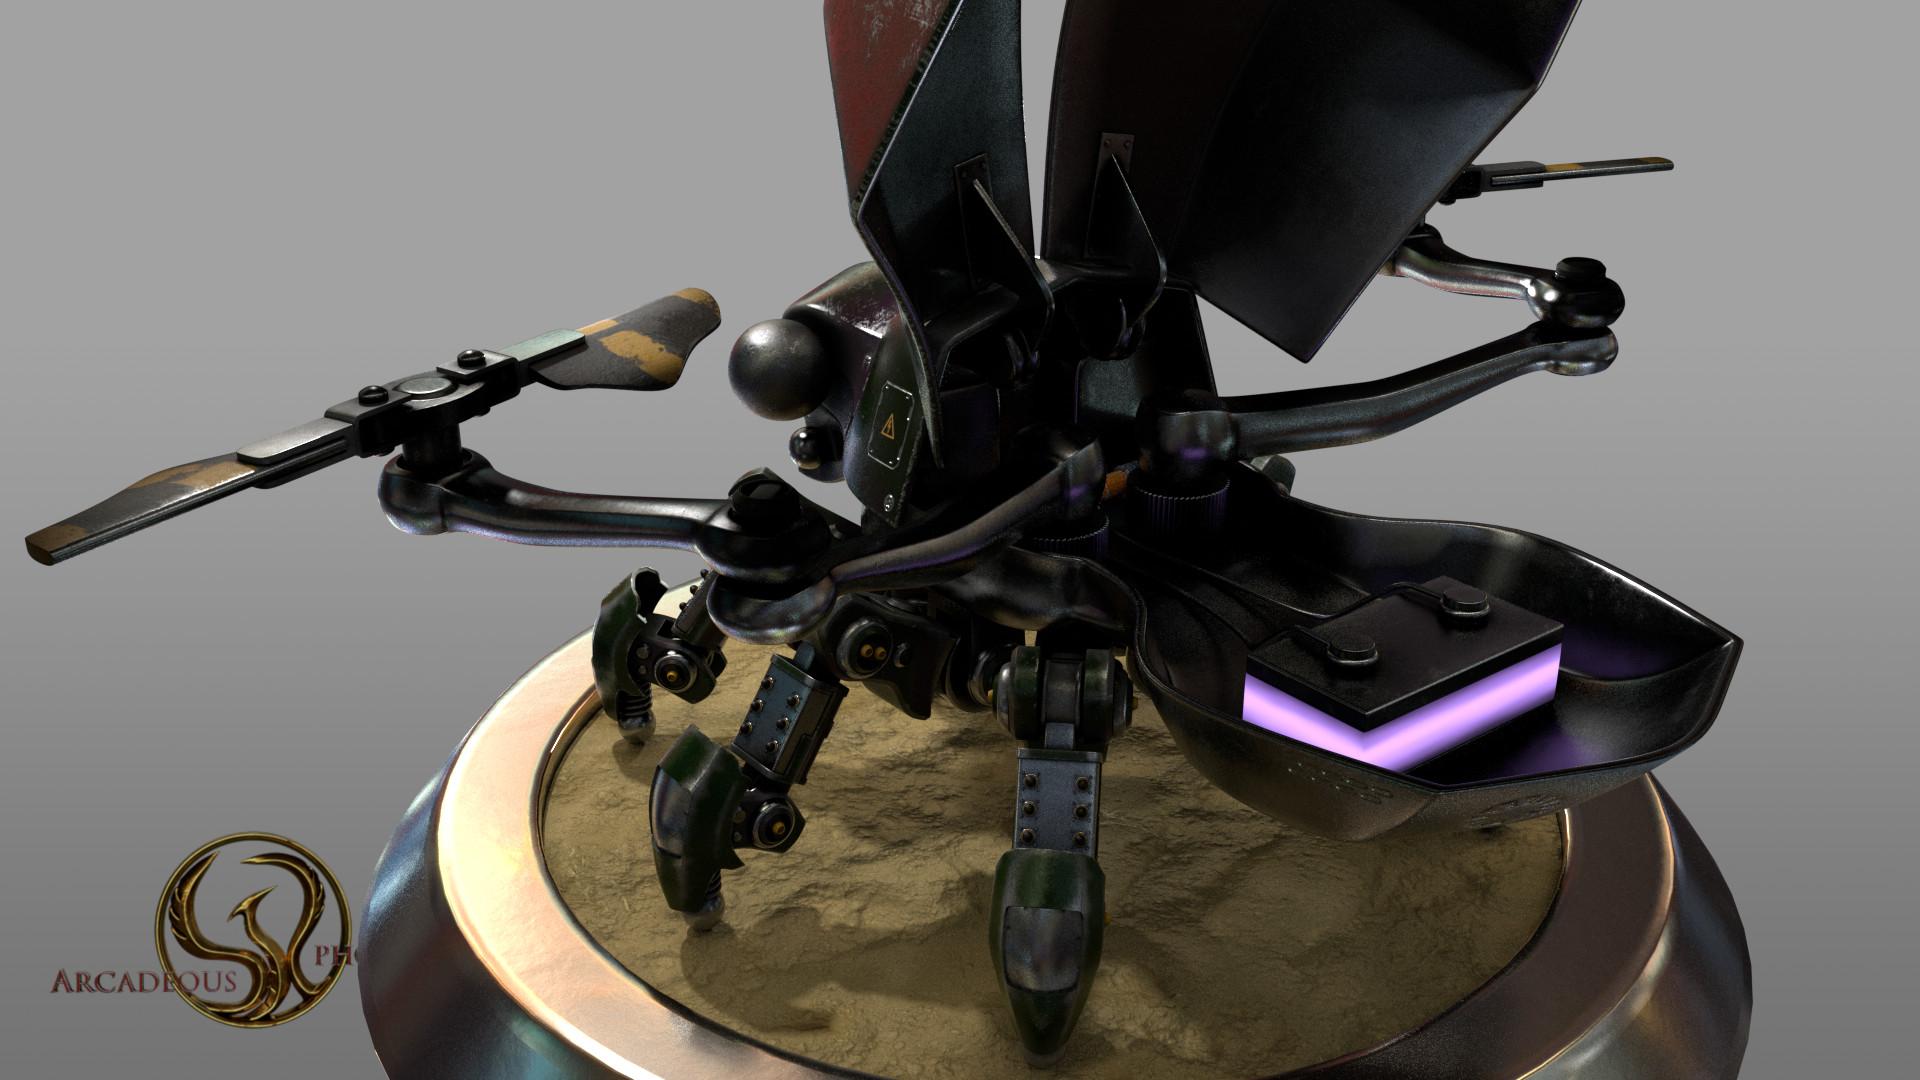 Arcadeous phoenix scarab weathered 4